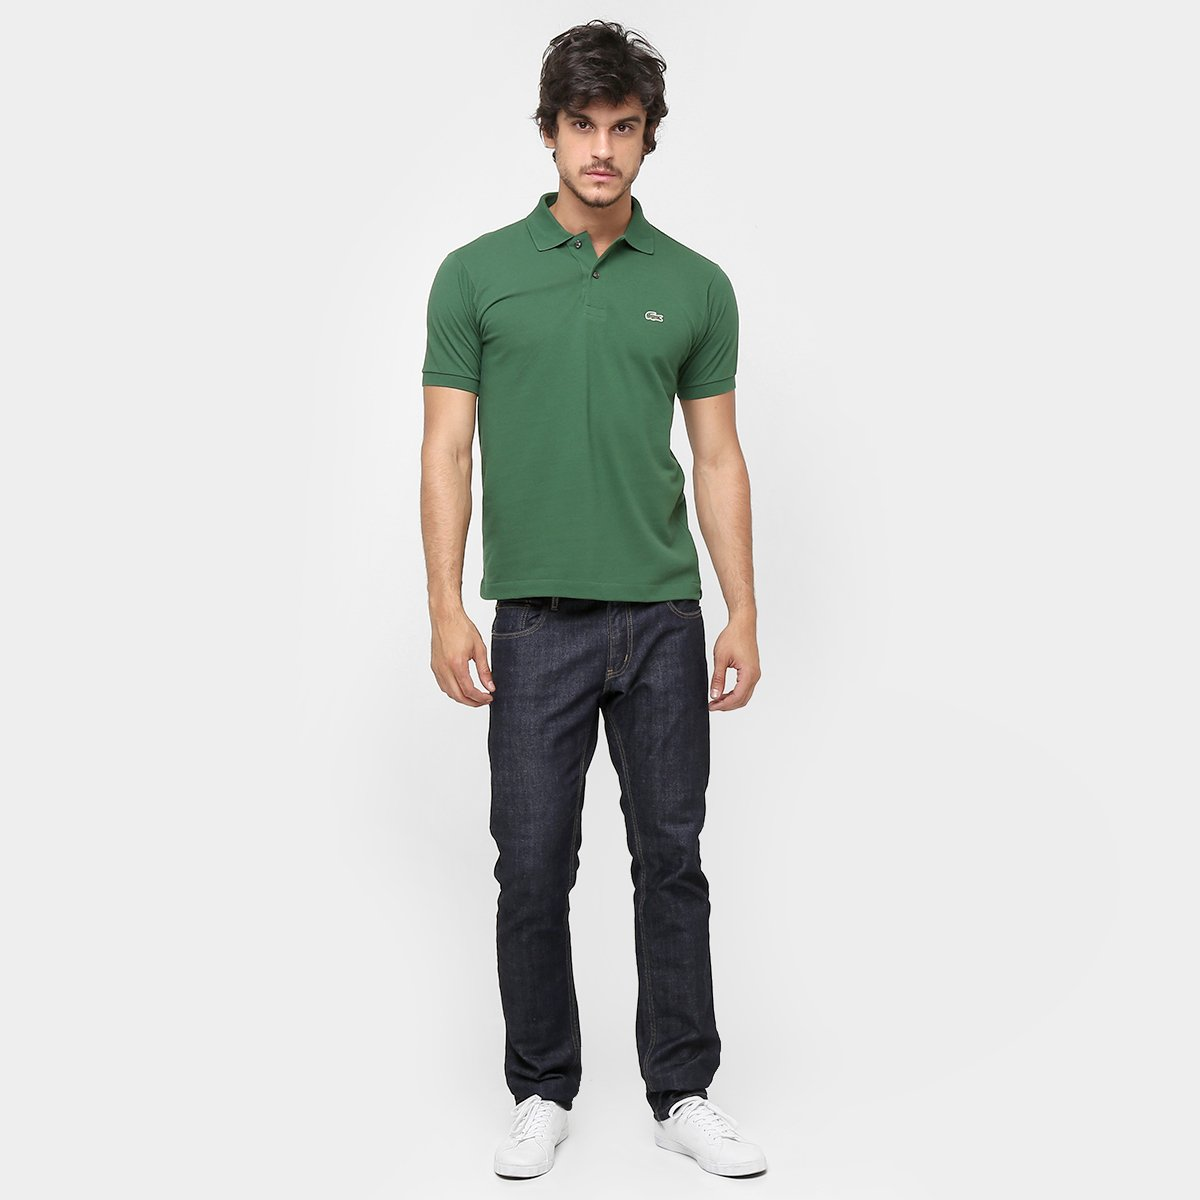 f934e1487c Camisa Polo Lacoste Original Fit Masculina - Verde Militar - Compre ...